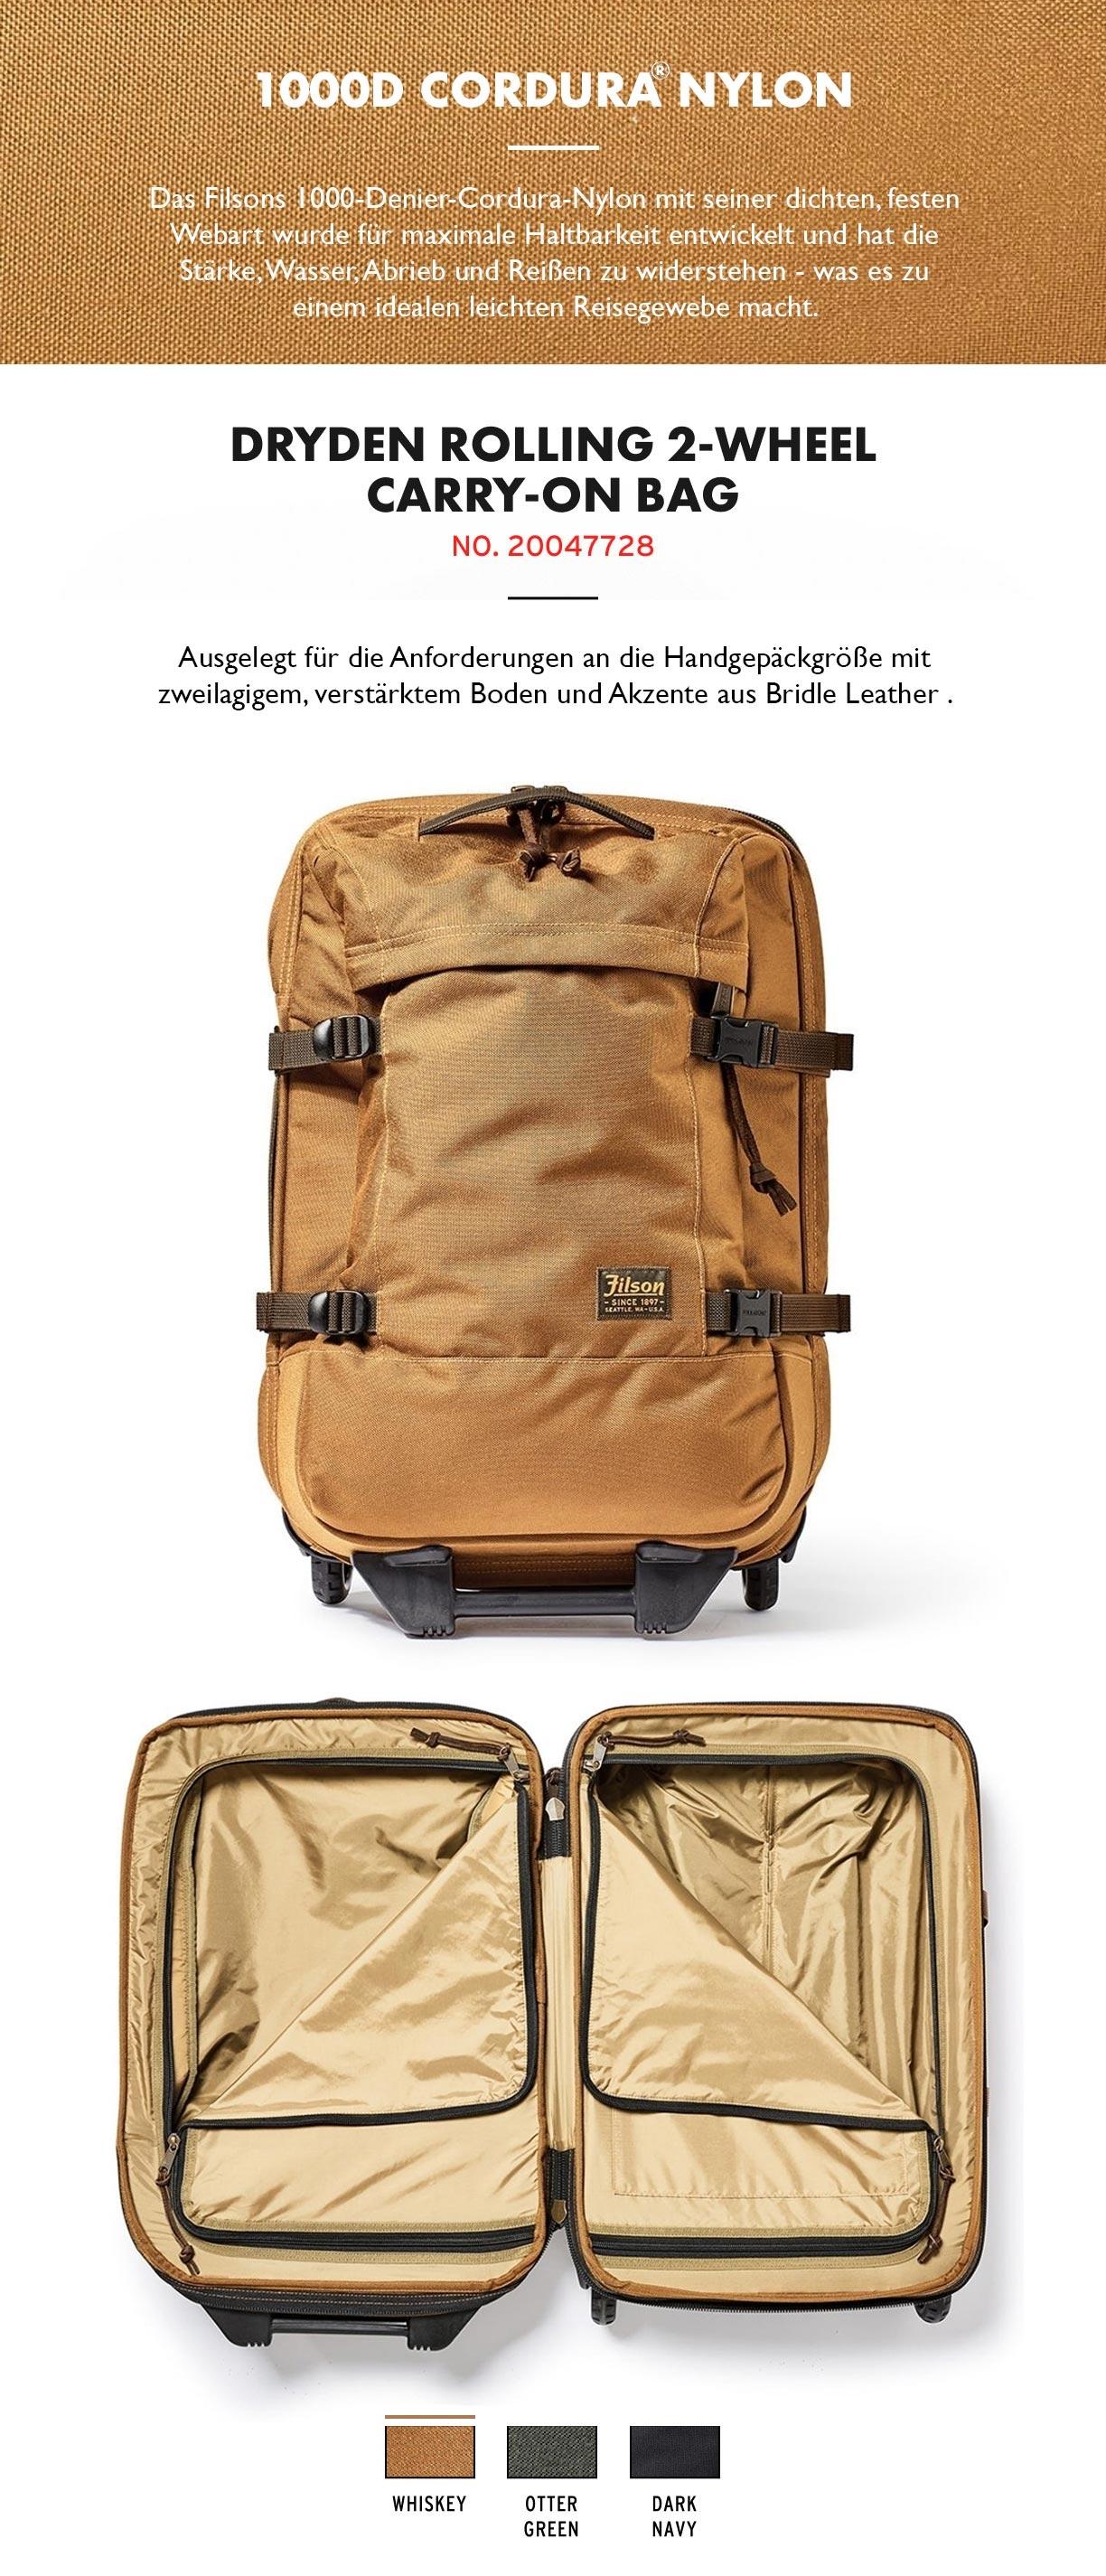 Filson Dryden 2-Wheel Rolling Carry-On Bag Whiskey Produktinformationen